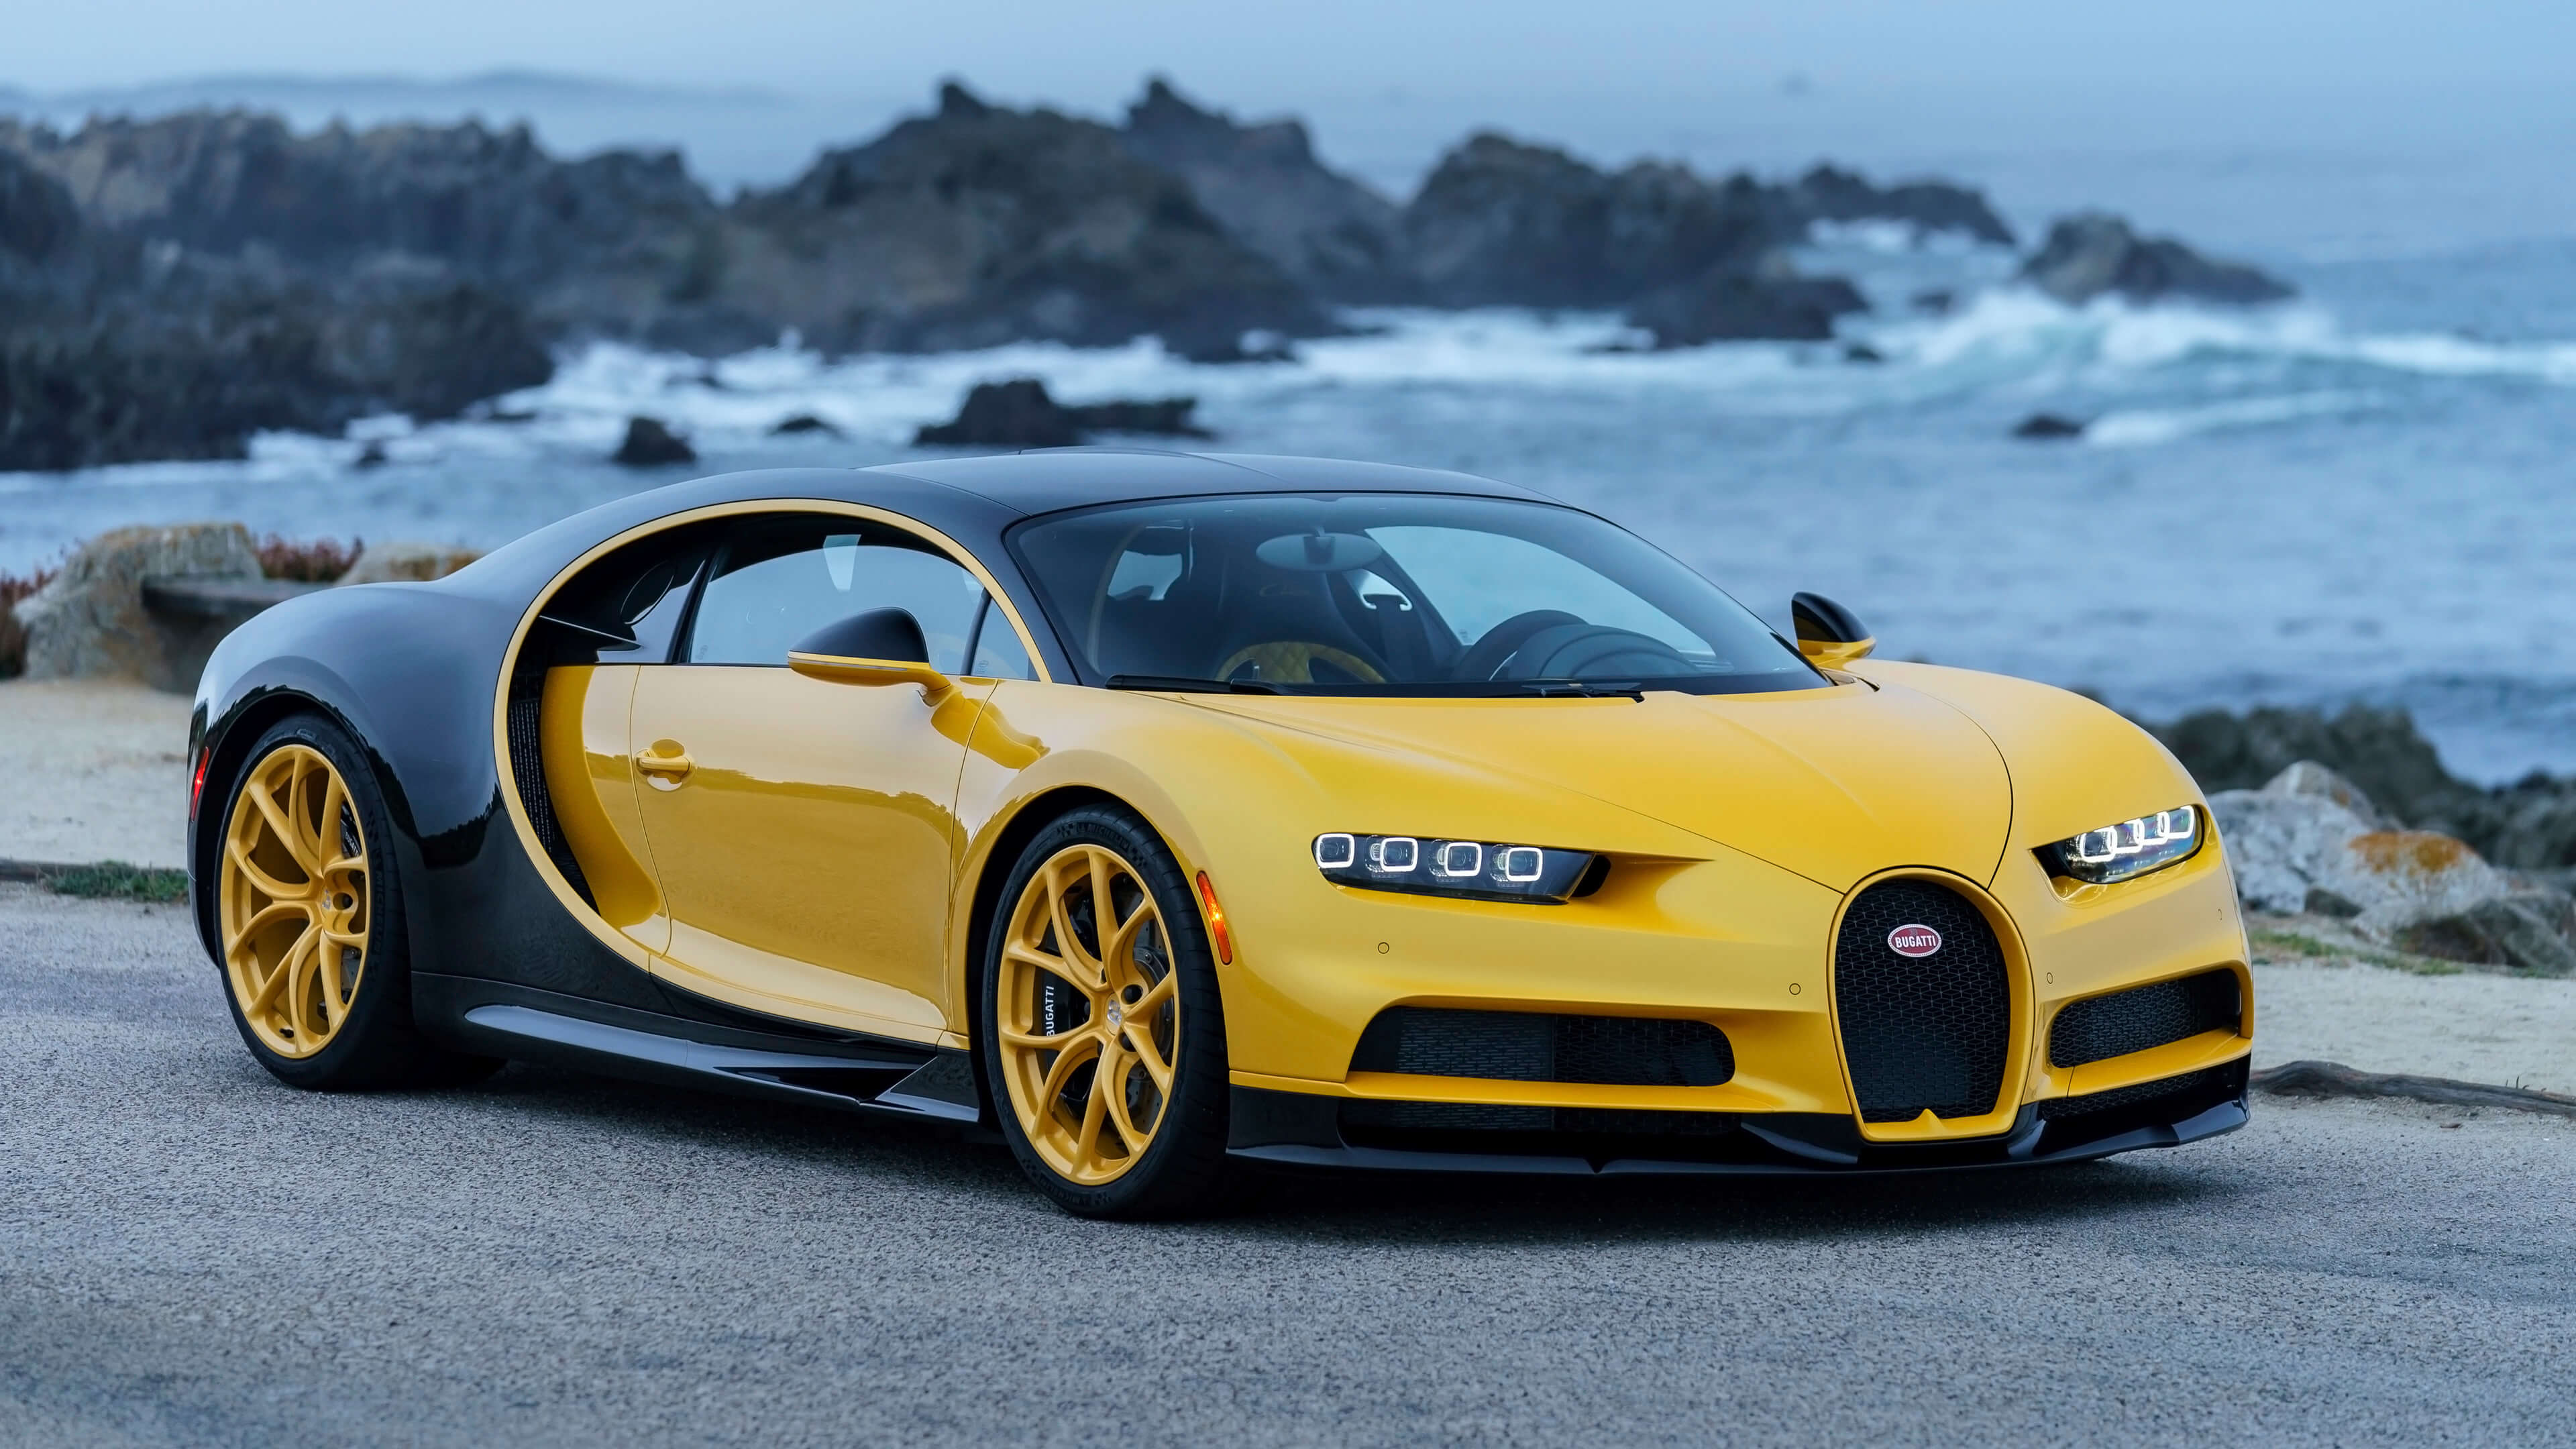 yellow bugatti widescreen wallpaper 67215